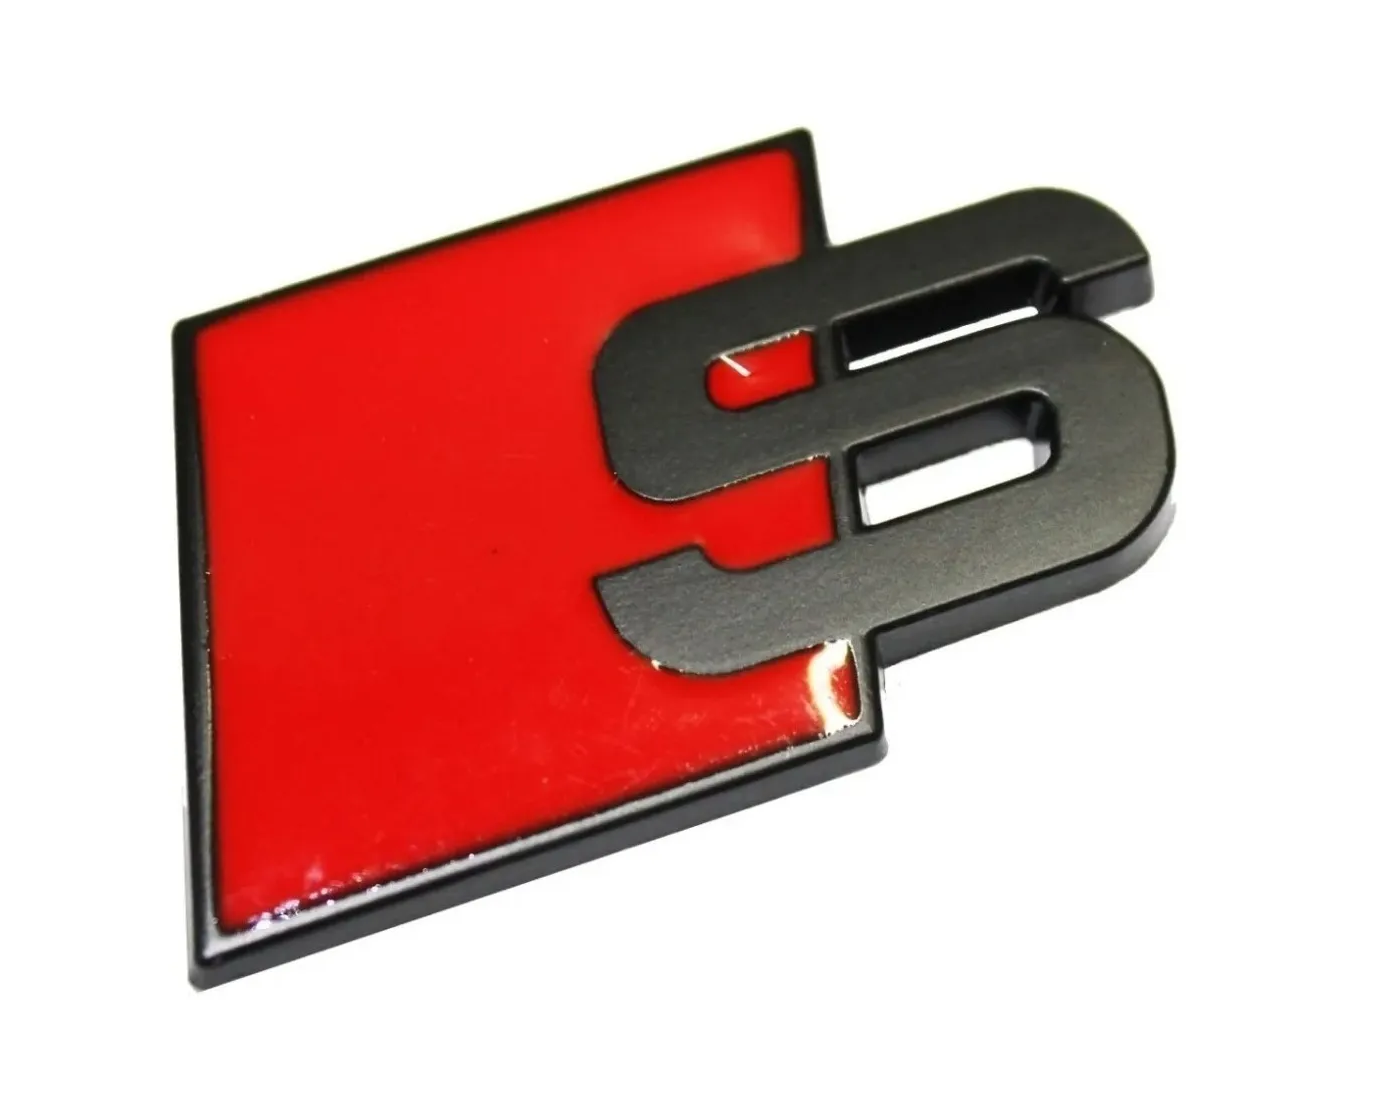 Emblema Adesivo S para Audi S Line S-Line Sline